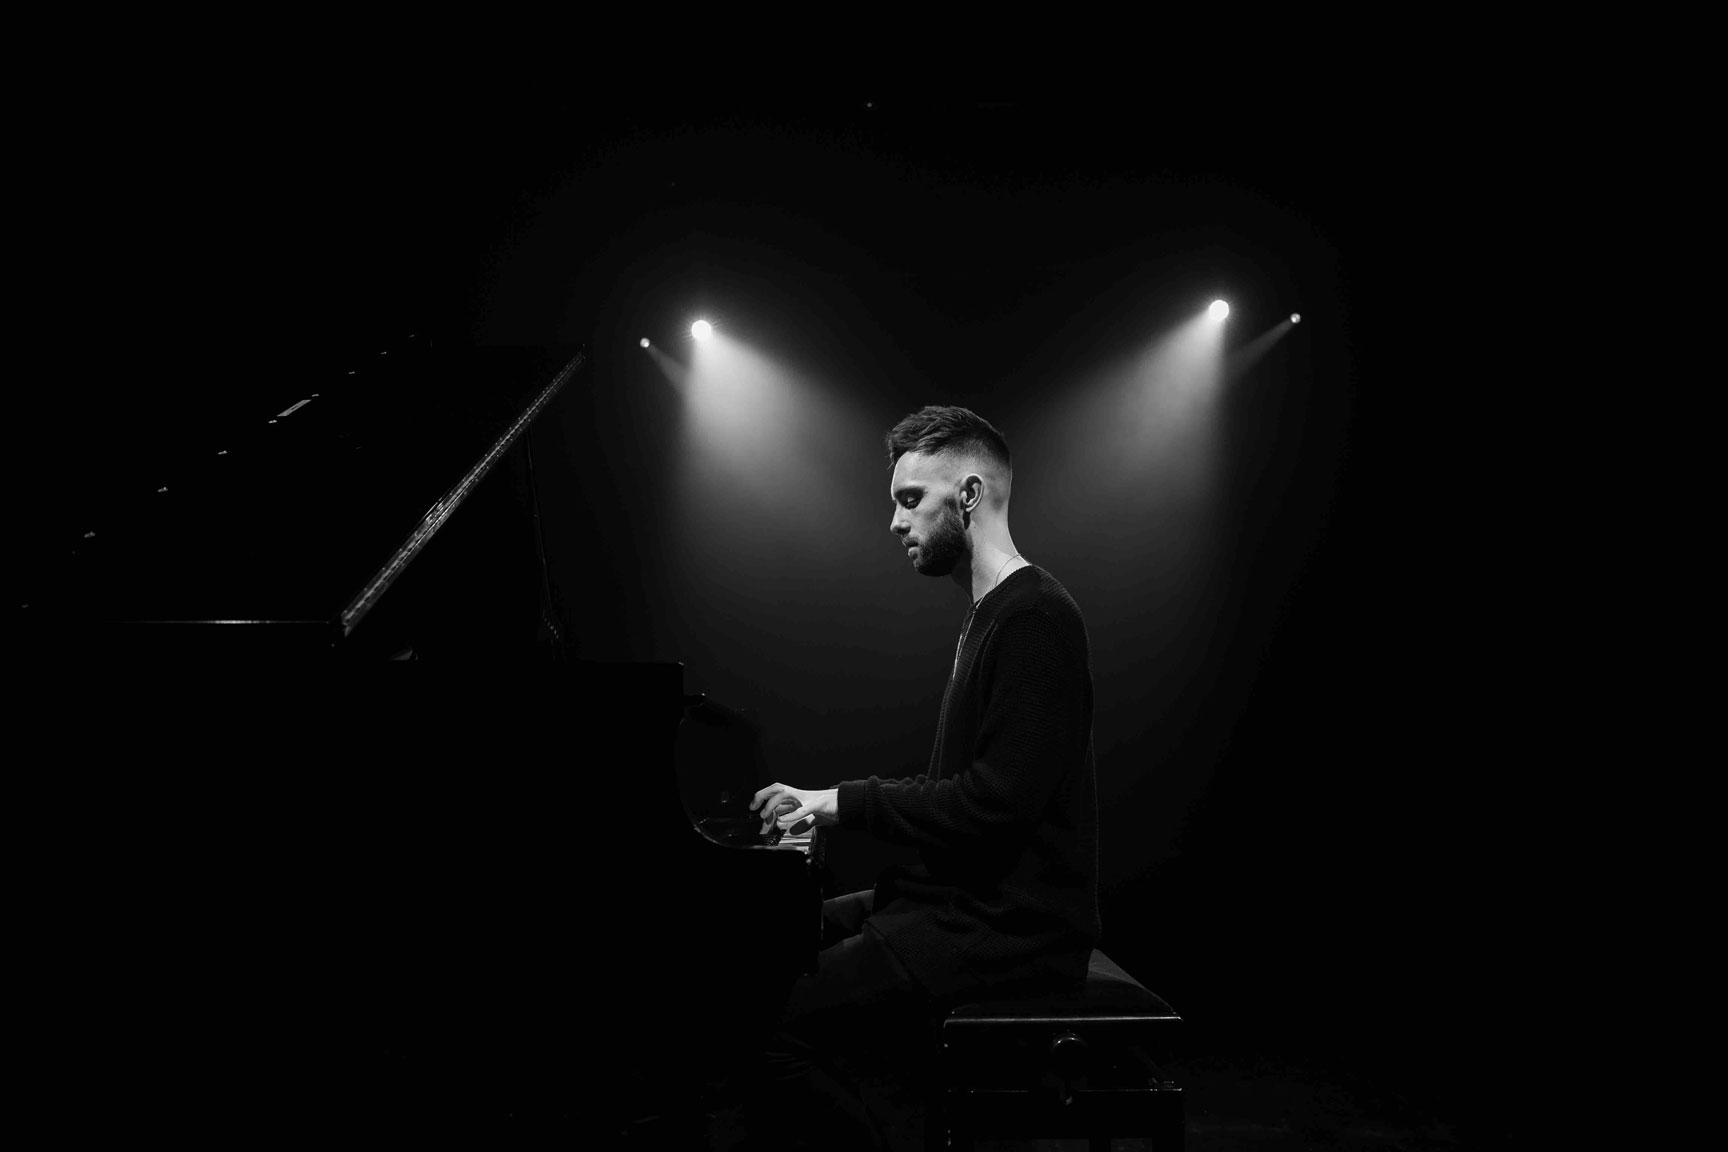 Lewis | Piano instrumentalist